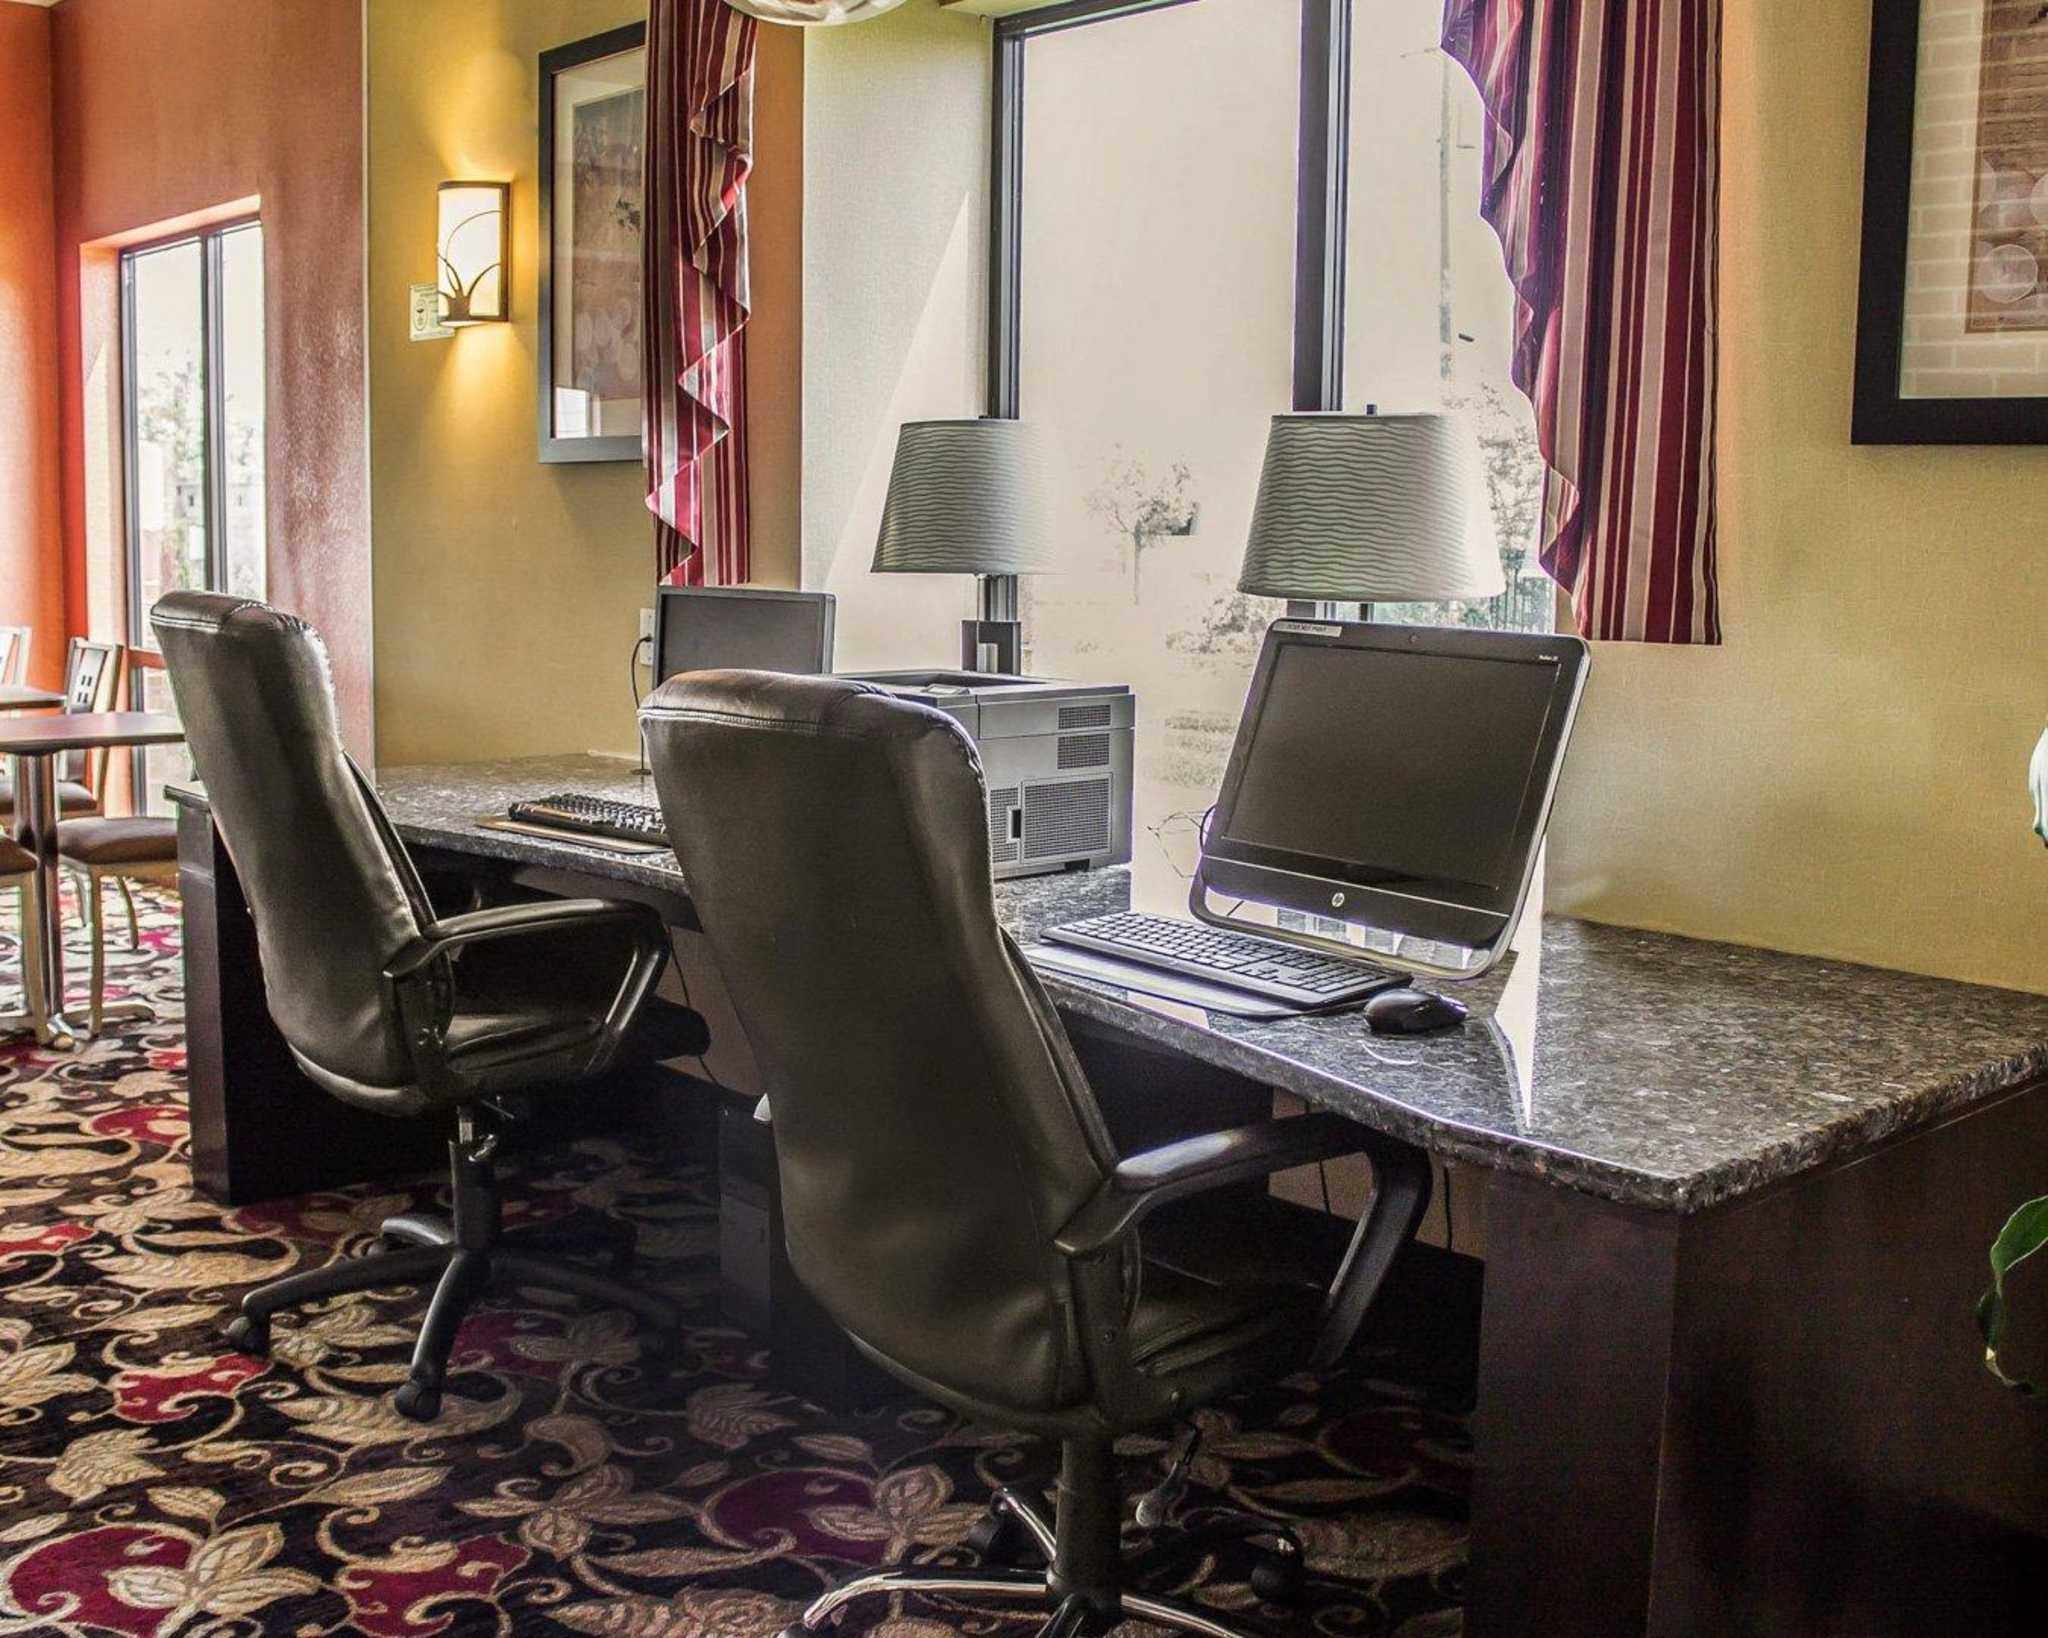 Comfort Suites East Broad at 270 image 56